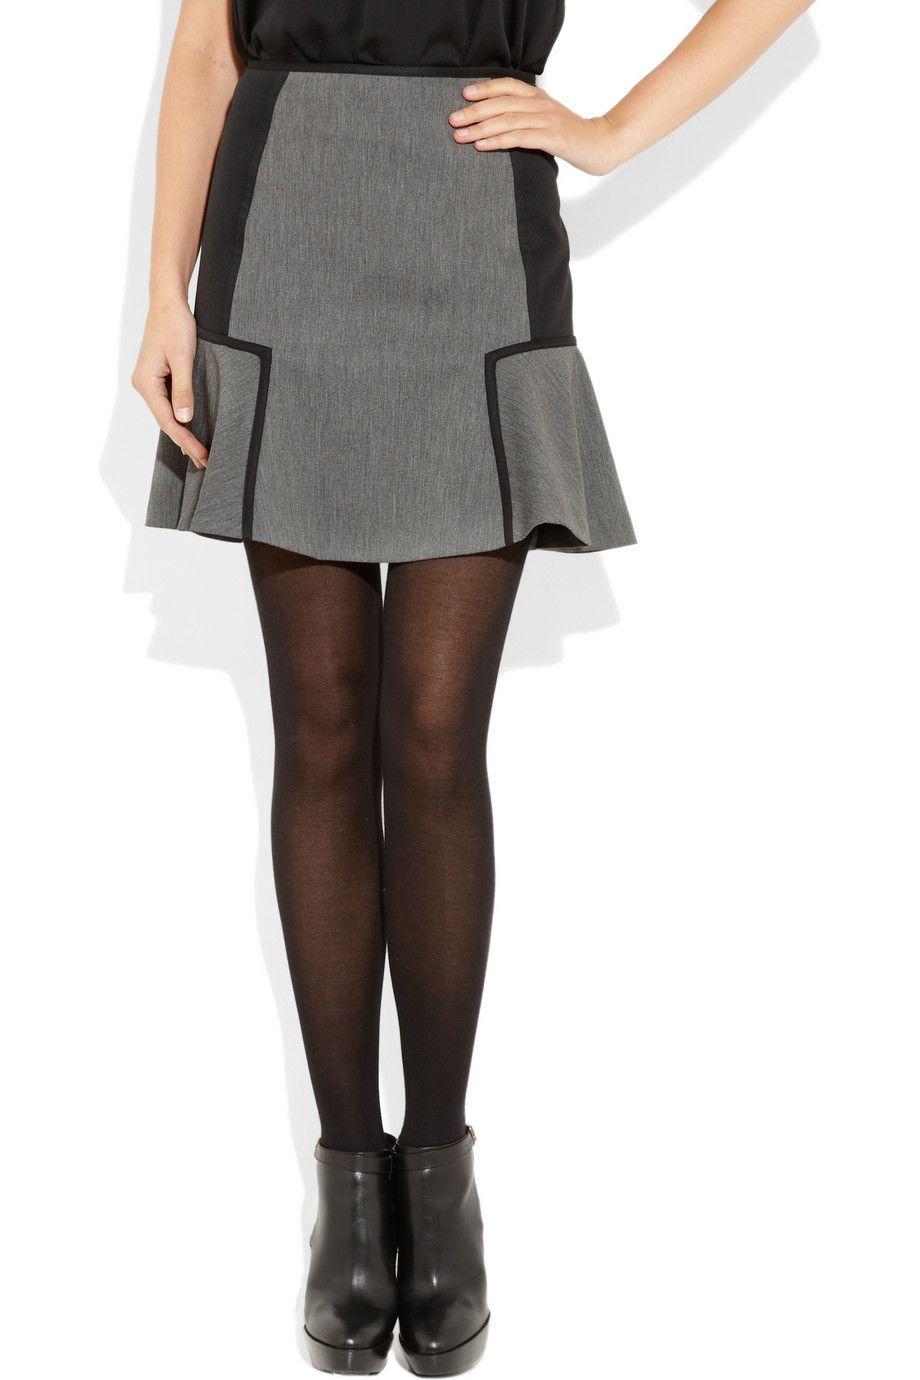 DKNY - Flared twill and satin mini skirt - £270